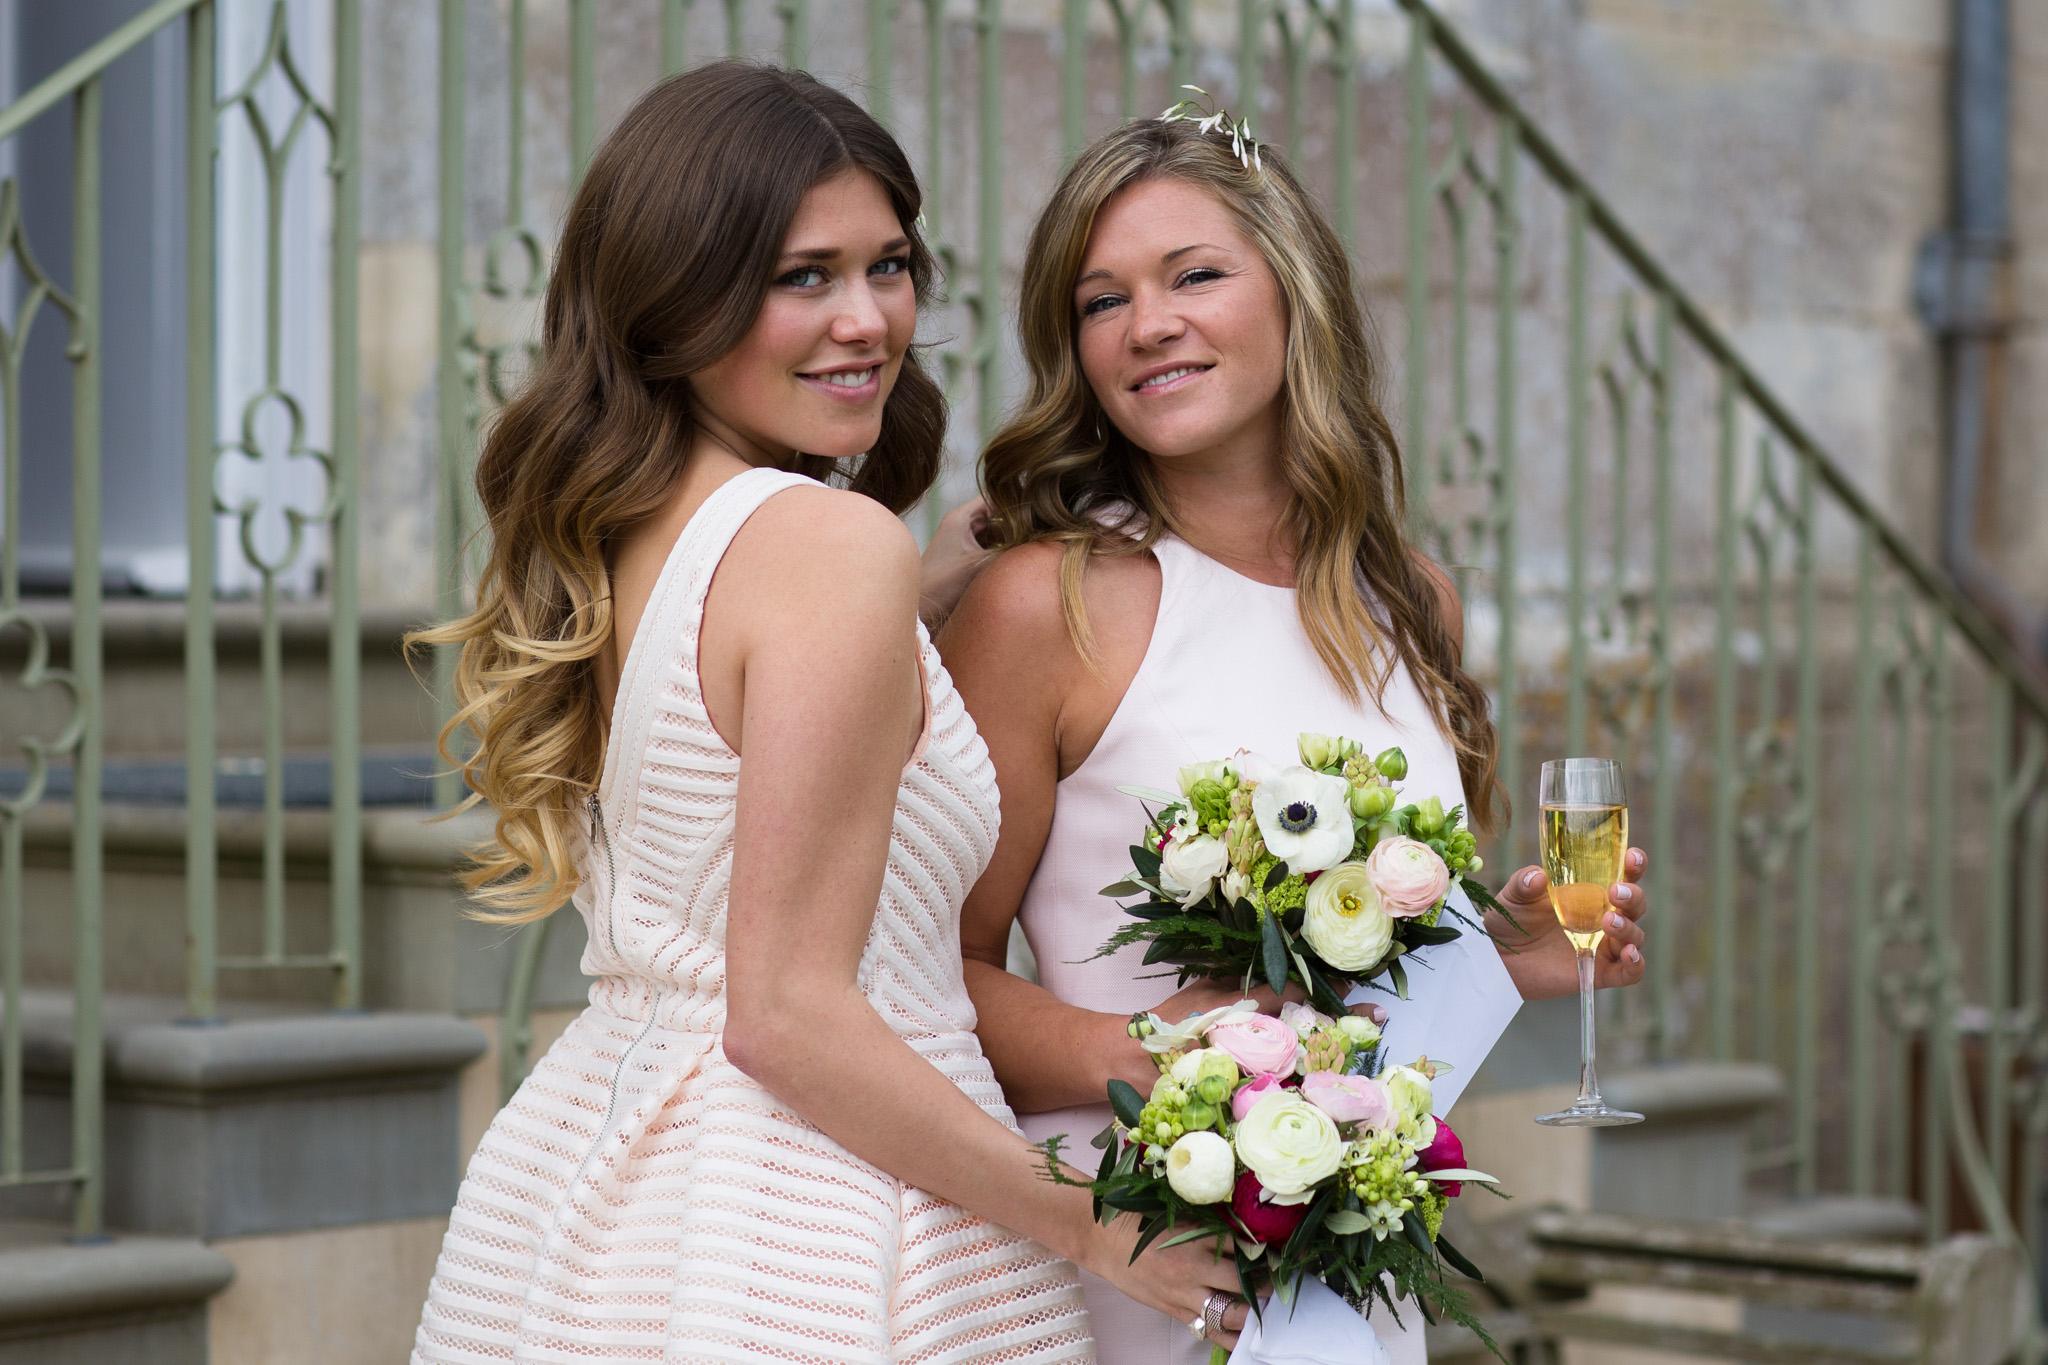 Mark_Barnes_Gloucester_Wedding_Photographer_Elmore_Court_Wedding_Photography_Mike+Kelly-56.jpg